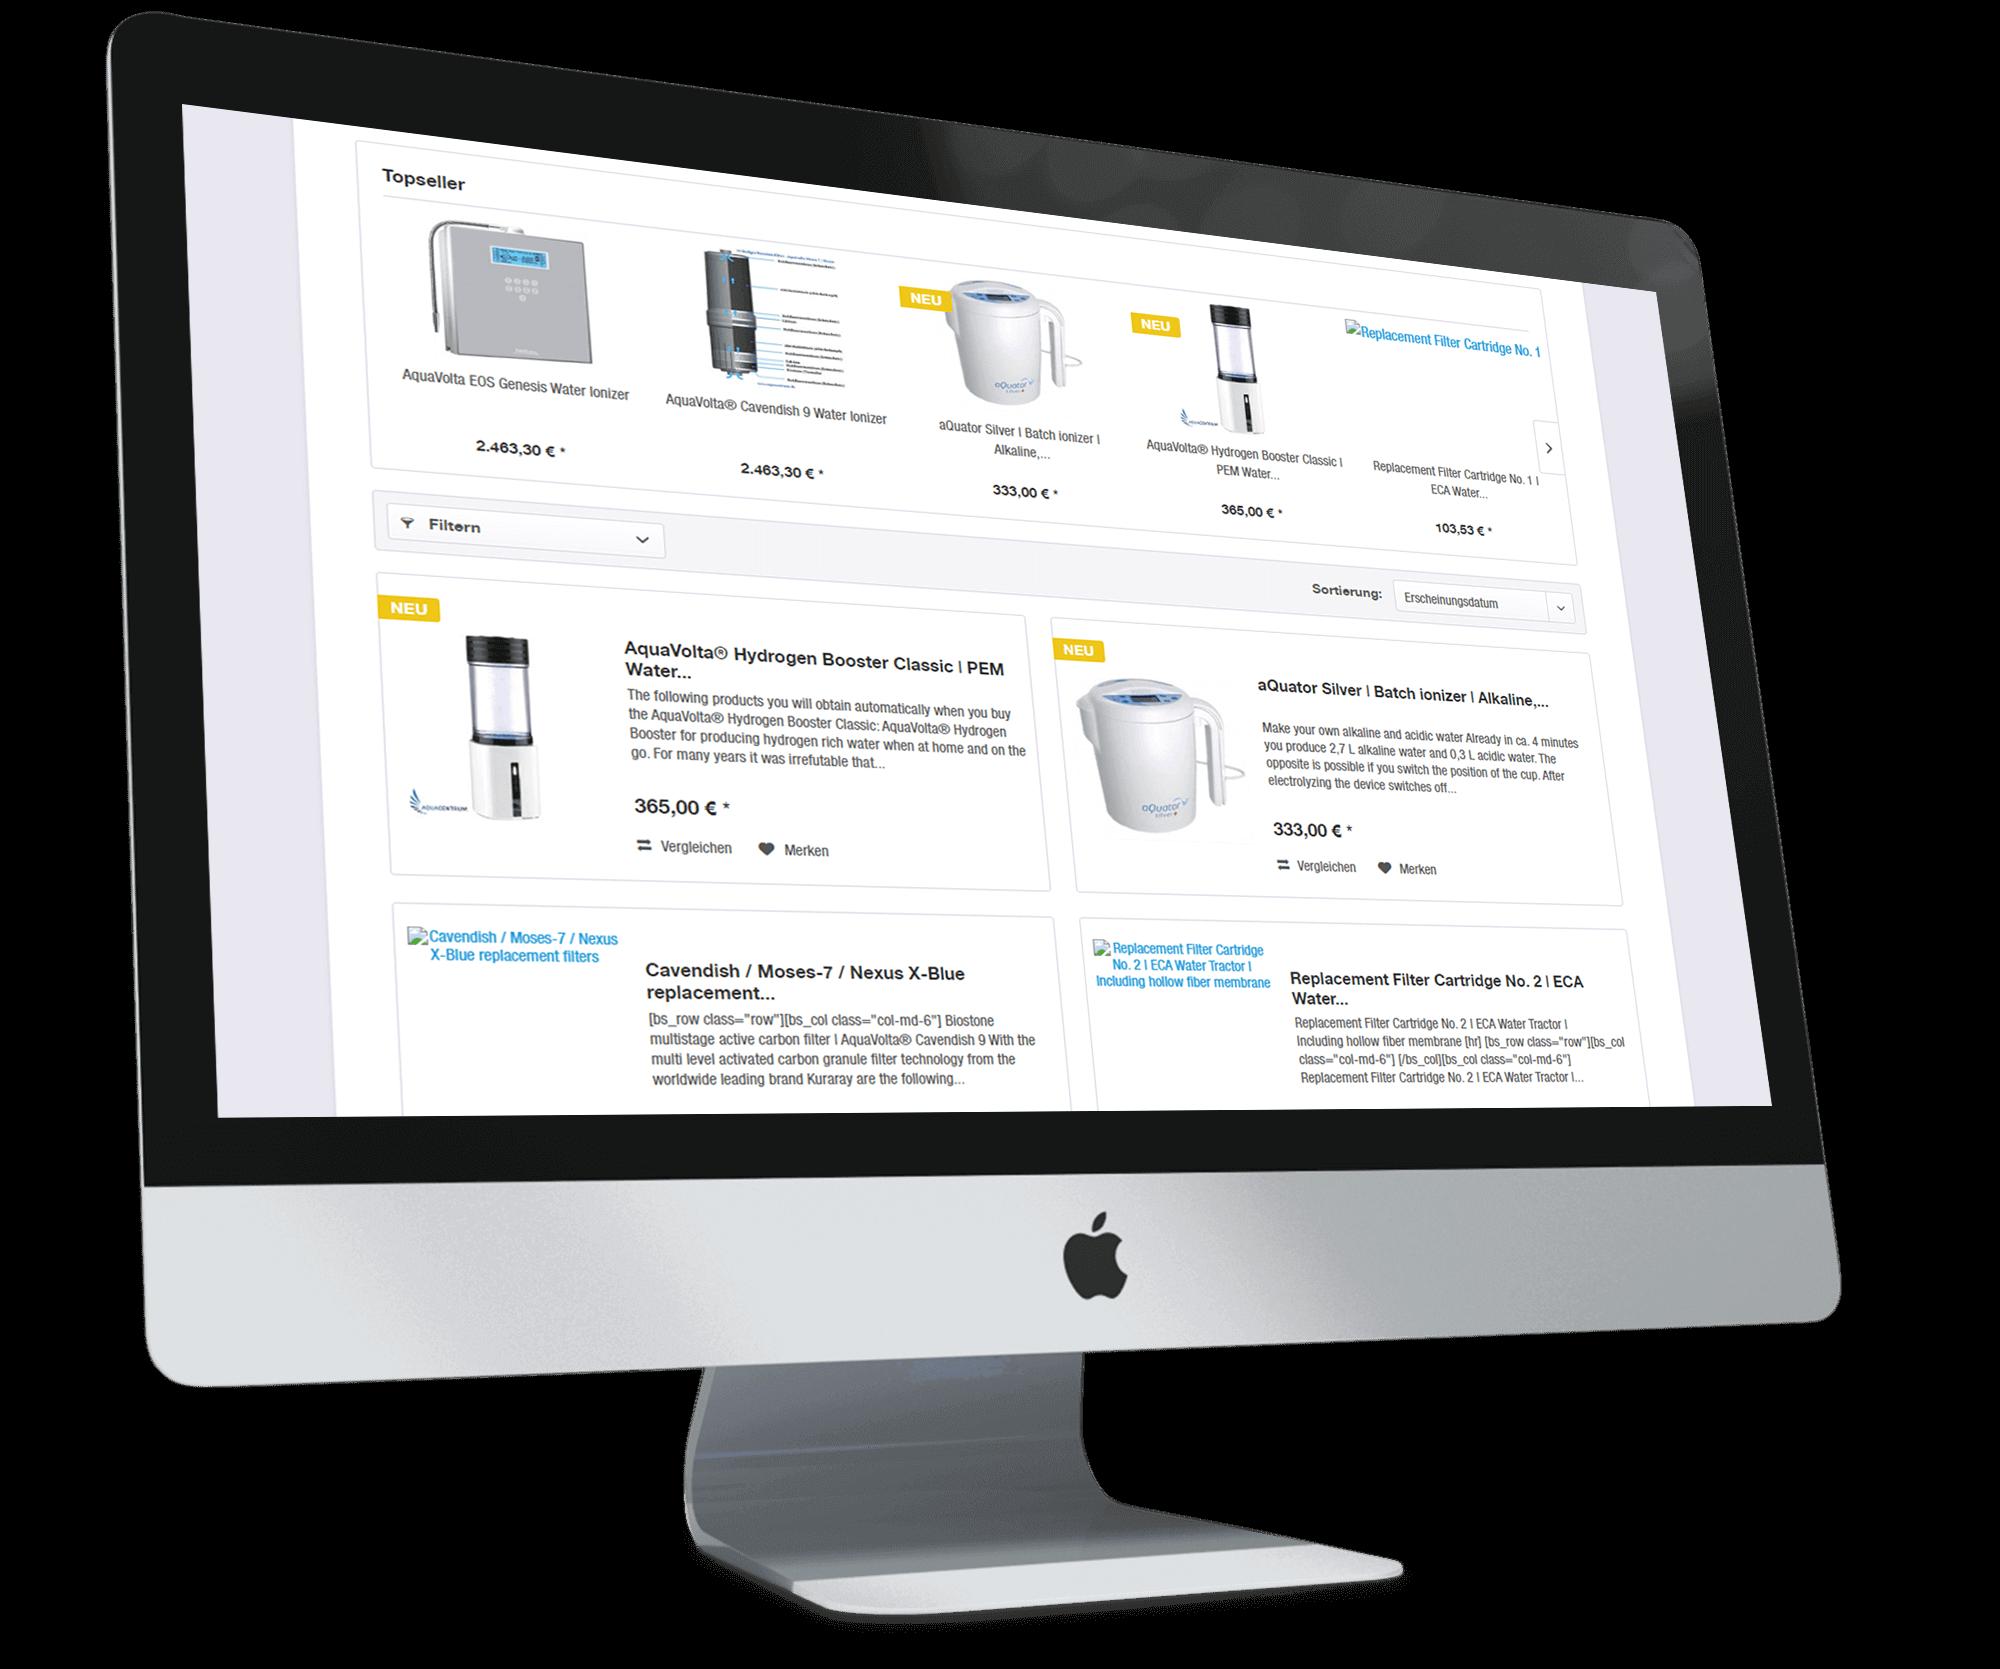 Brandcrock-Aquacentrum_BrandCrock-portfolio-Topseller-imac